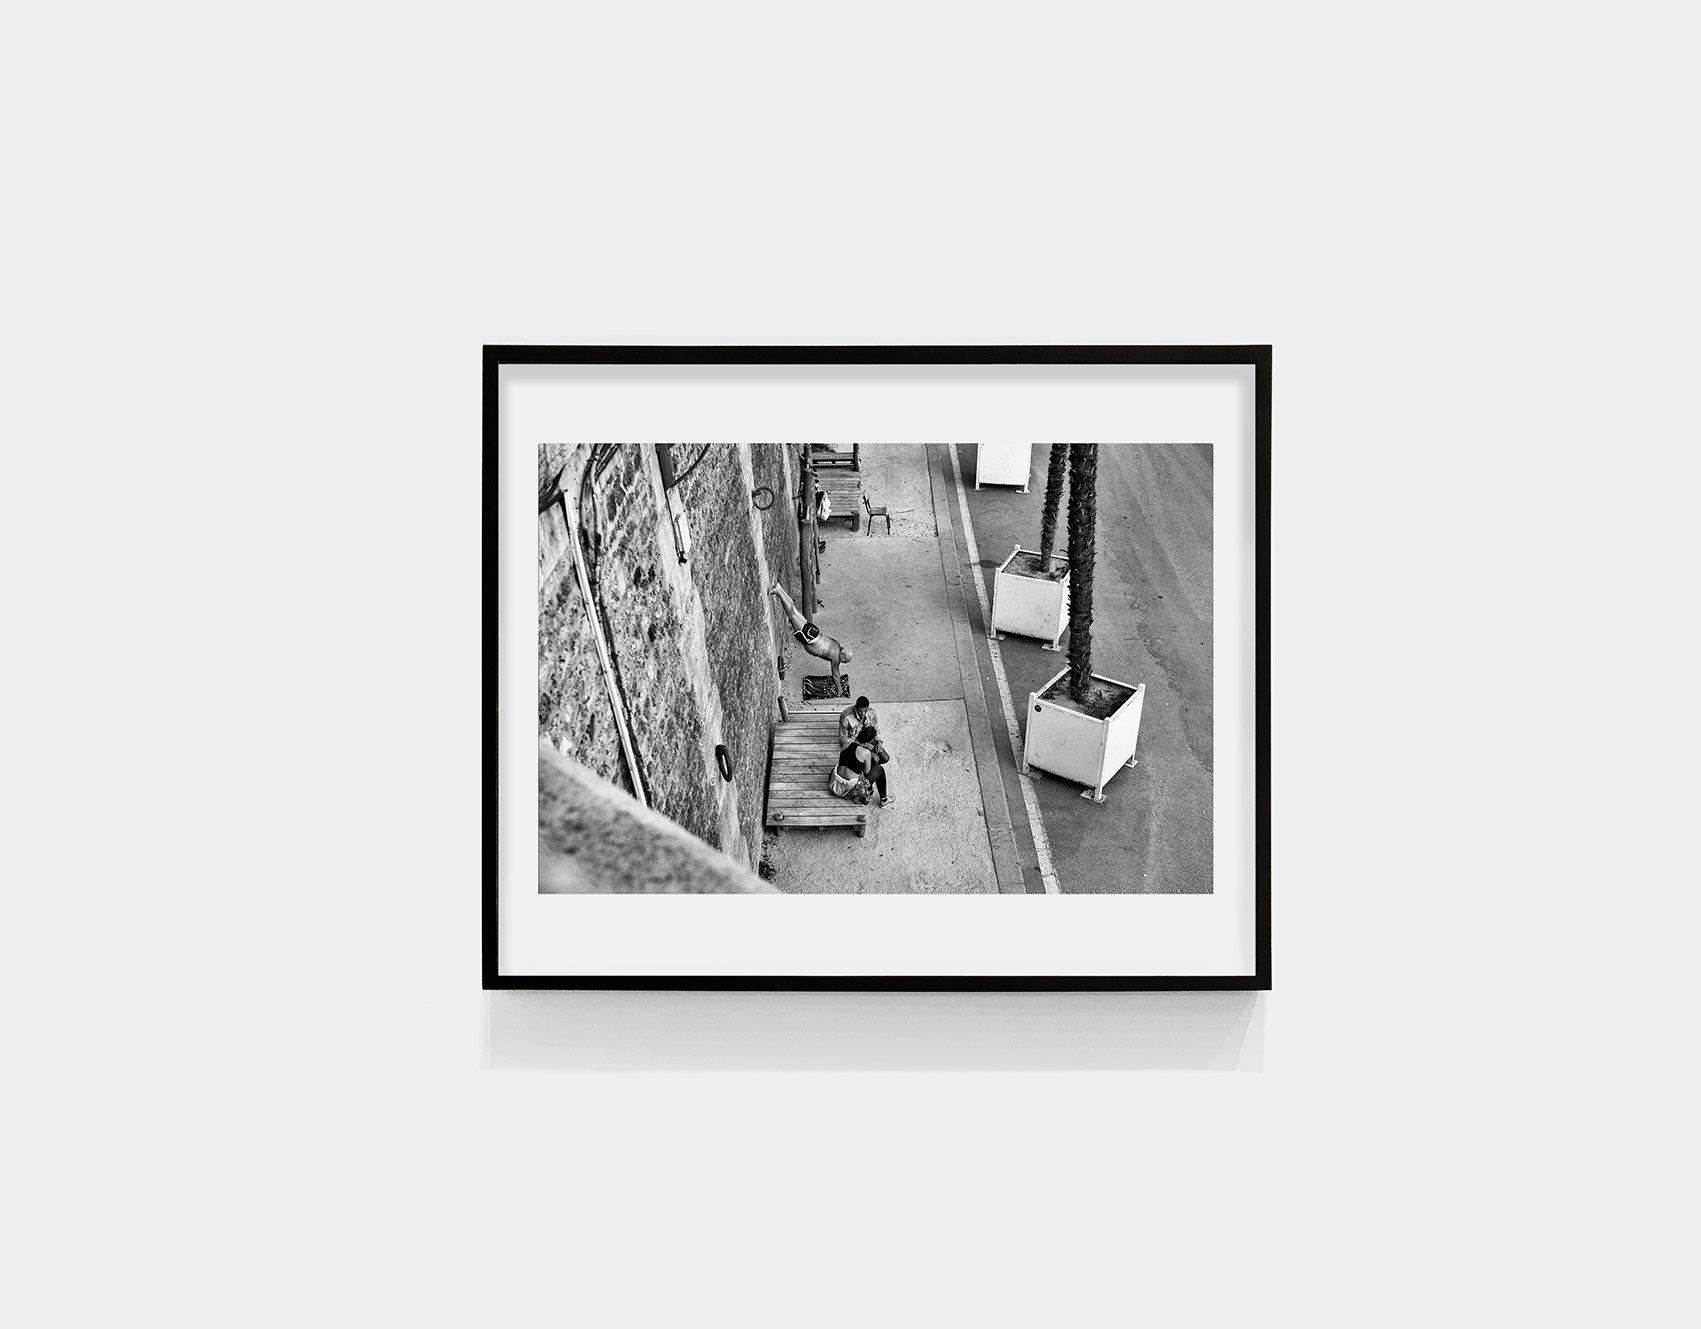 Tirage_Laurent_Delhourme_ Voie-Georges_Pompidou,_Paris_1er